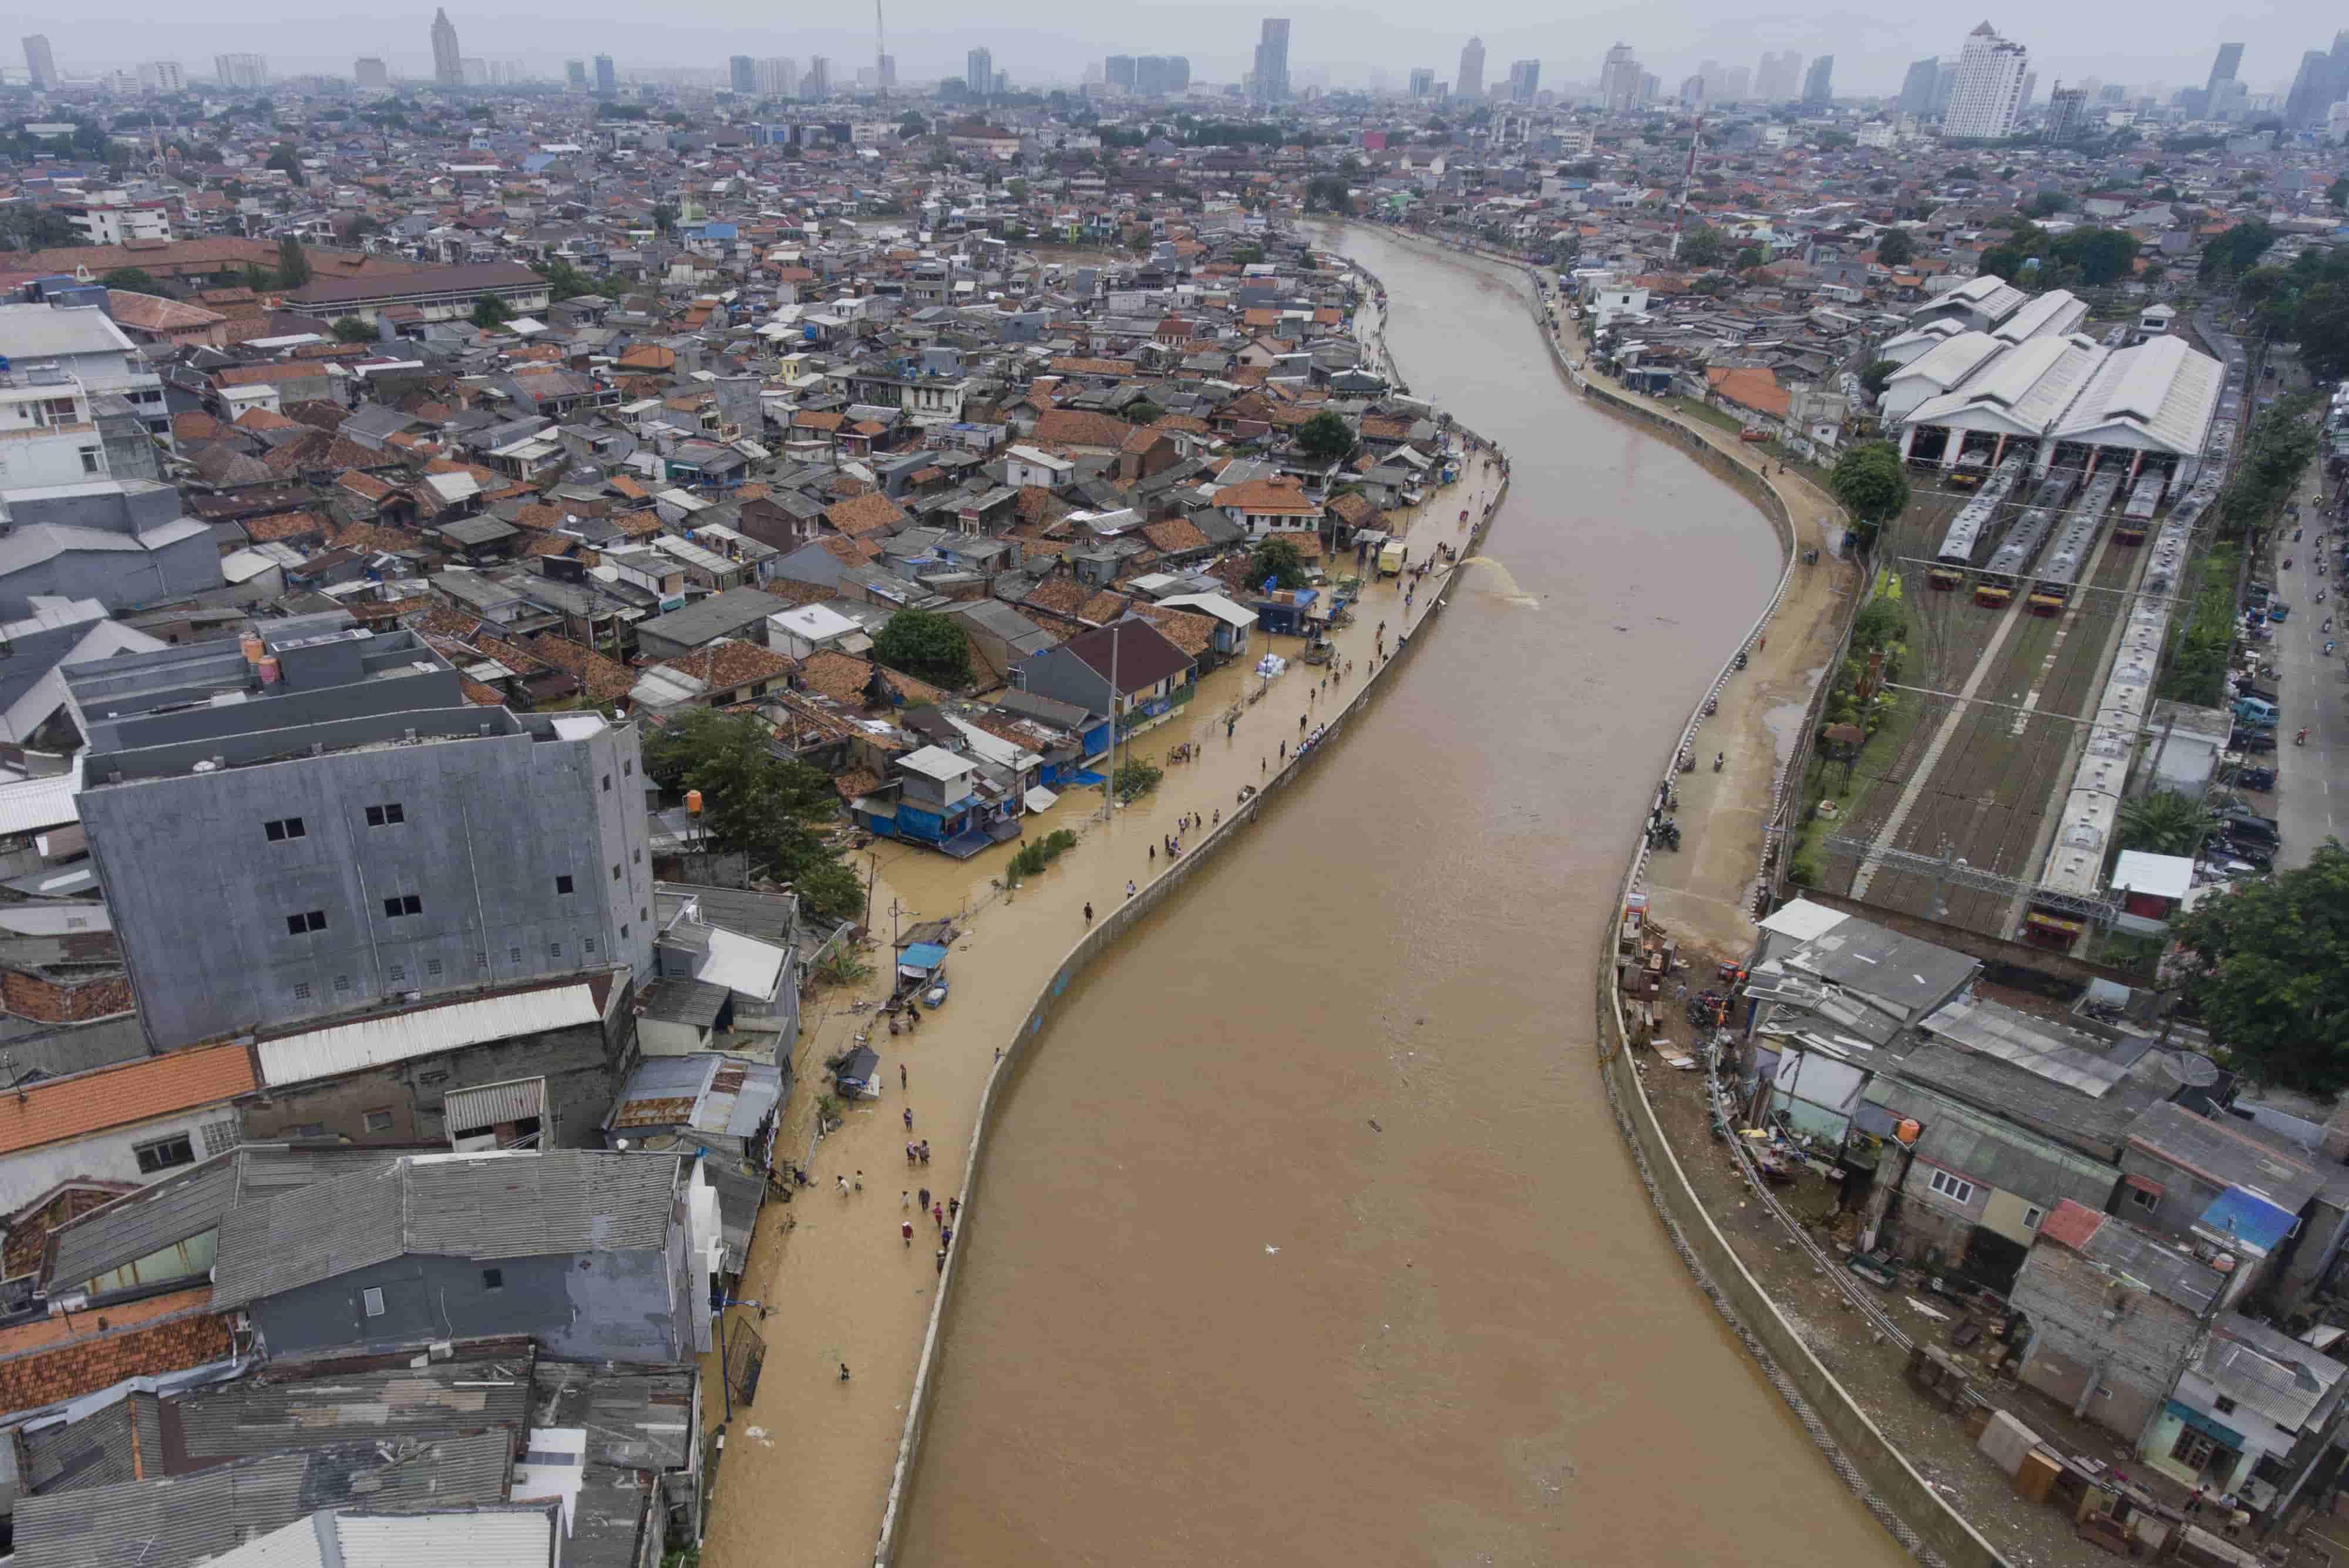 Solusi Banjir Jakarta, Apa Kabar Program Normalisasi Sungai?